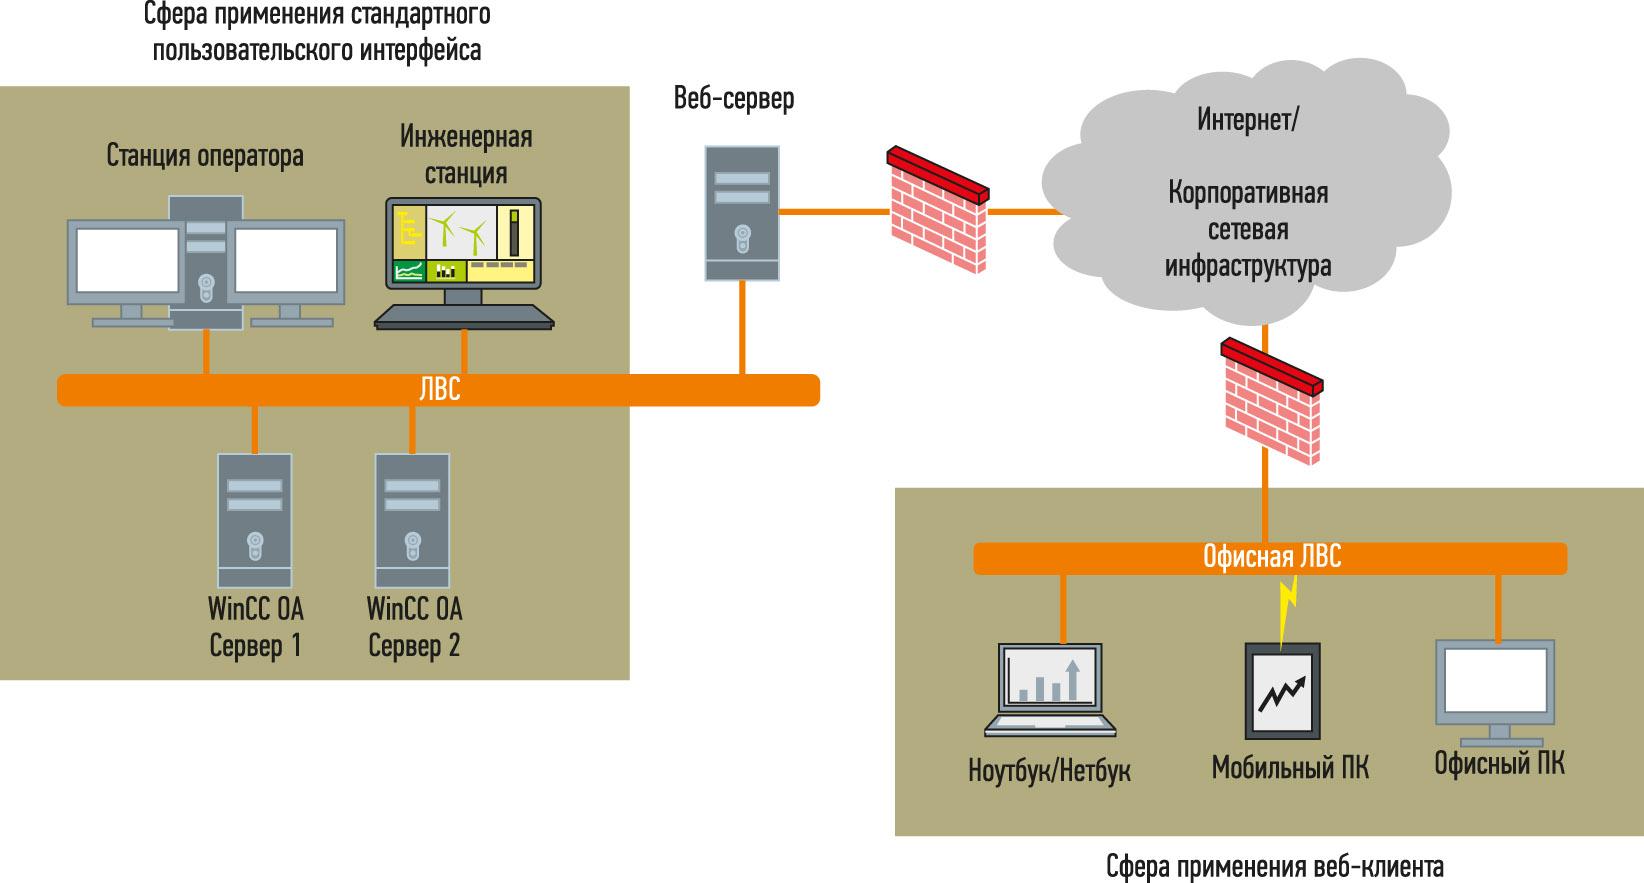 Рис. 1. Архитектура системы на базе WinCC OA с использованием веб-клиента WinCC OA